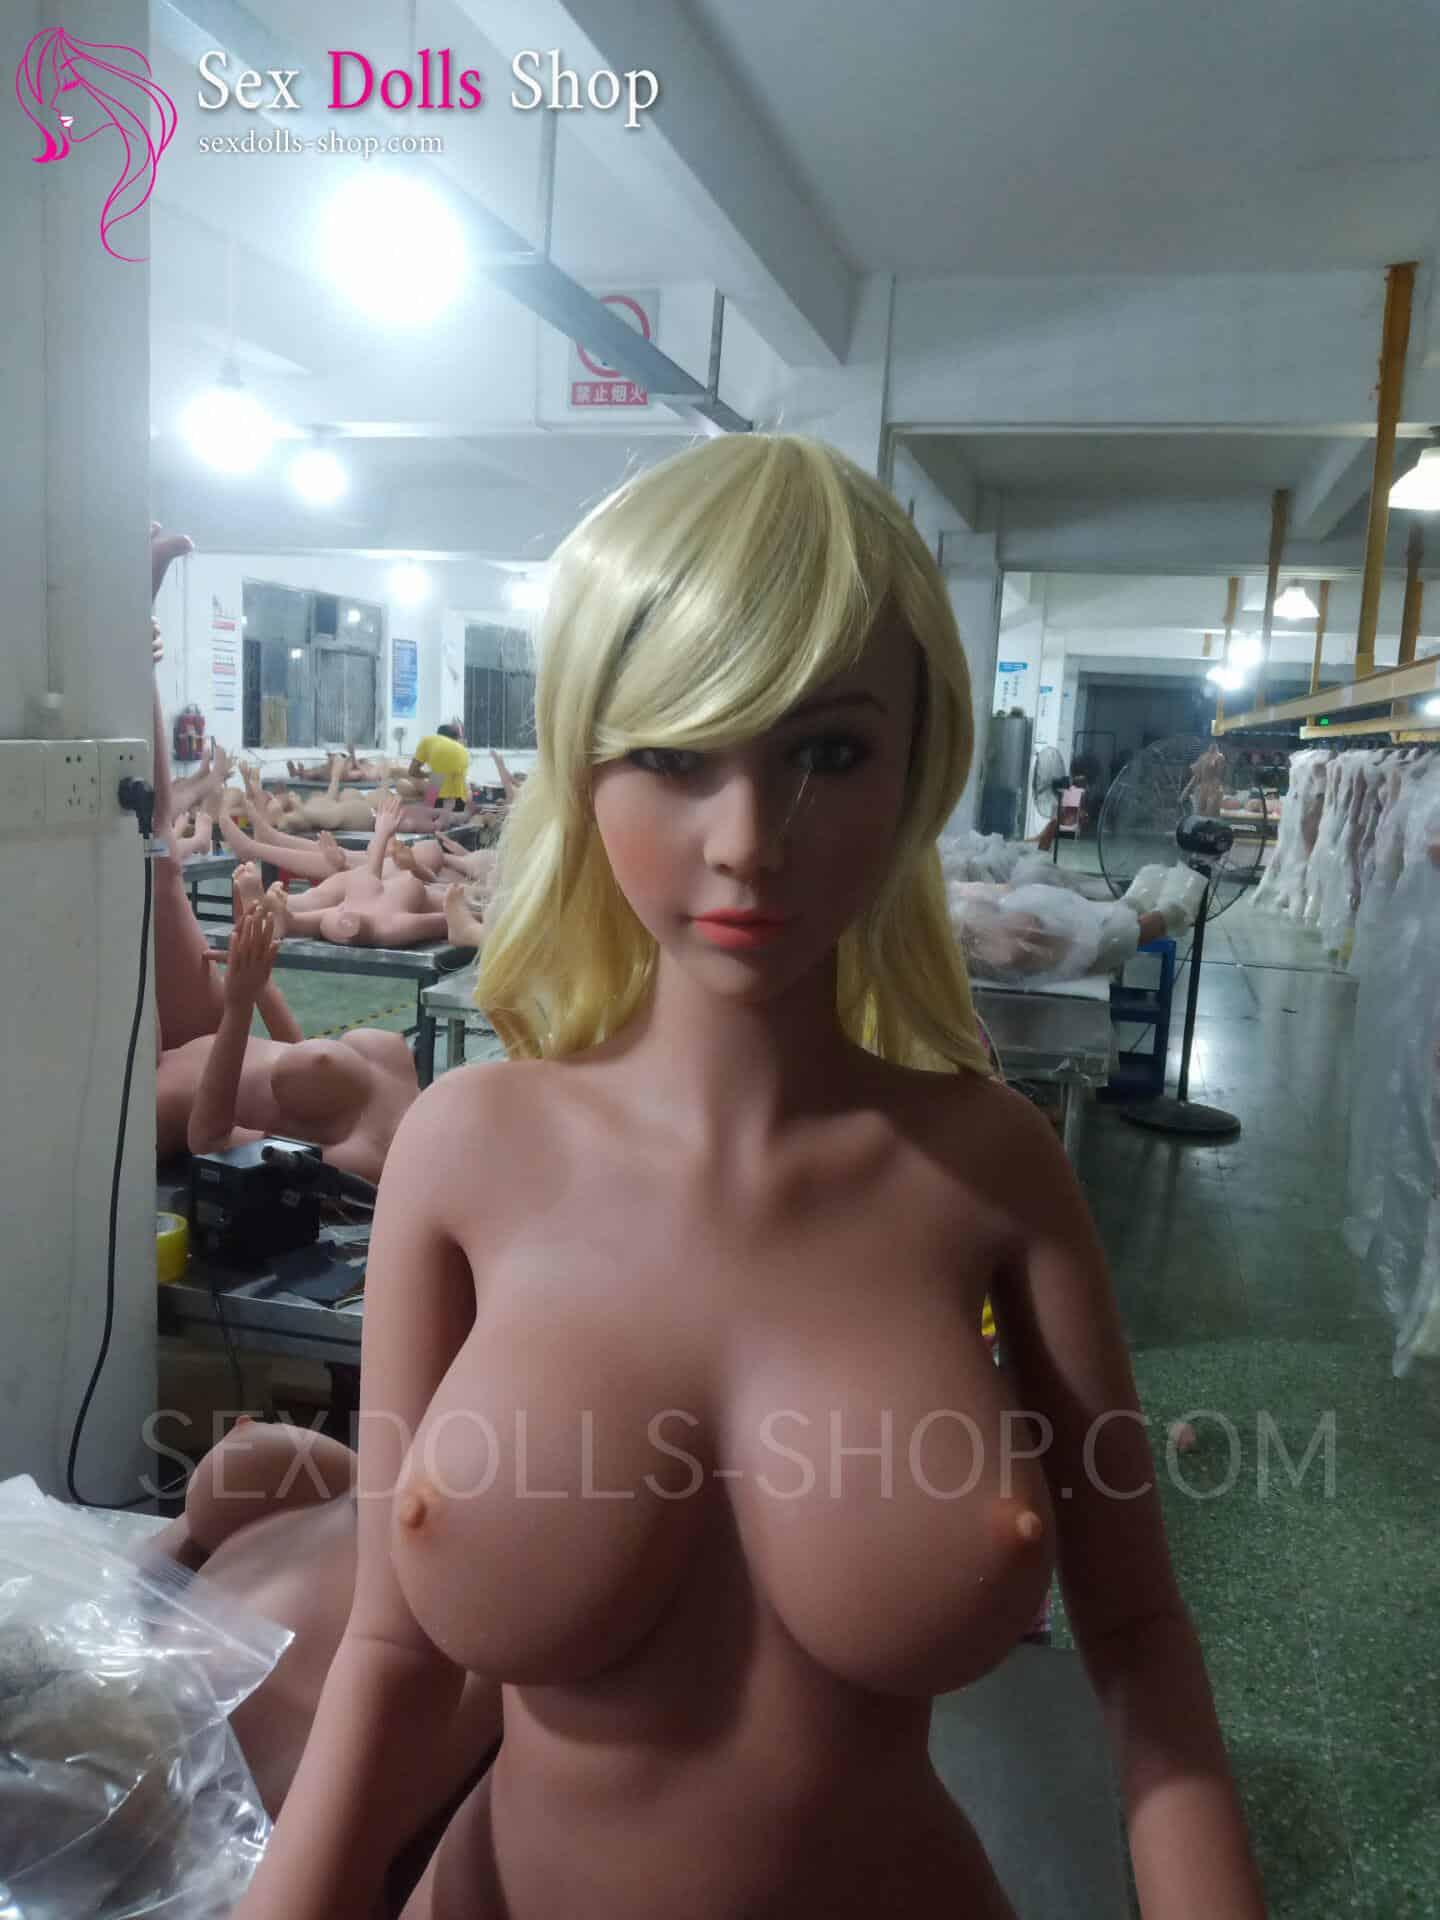 wm 162cm E cup tan skin light brown nipples head56